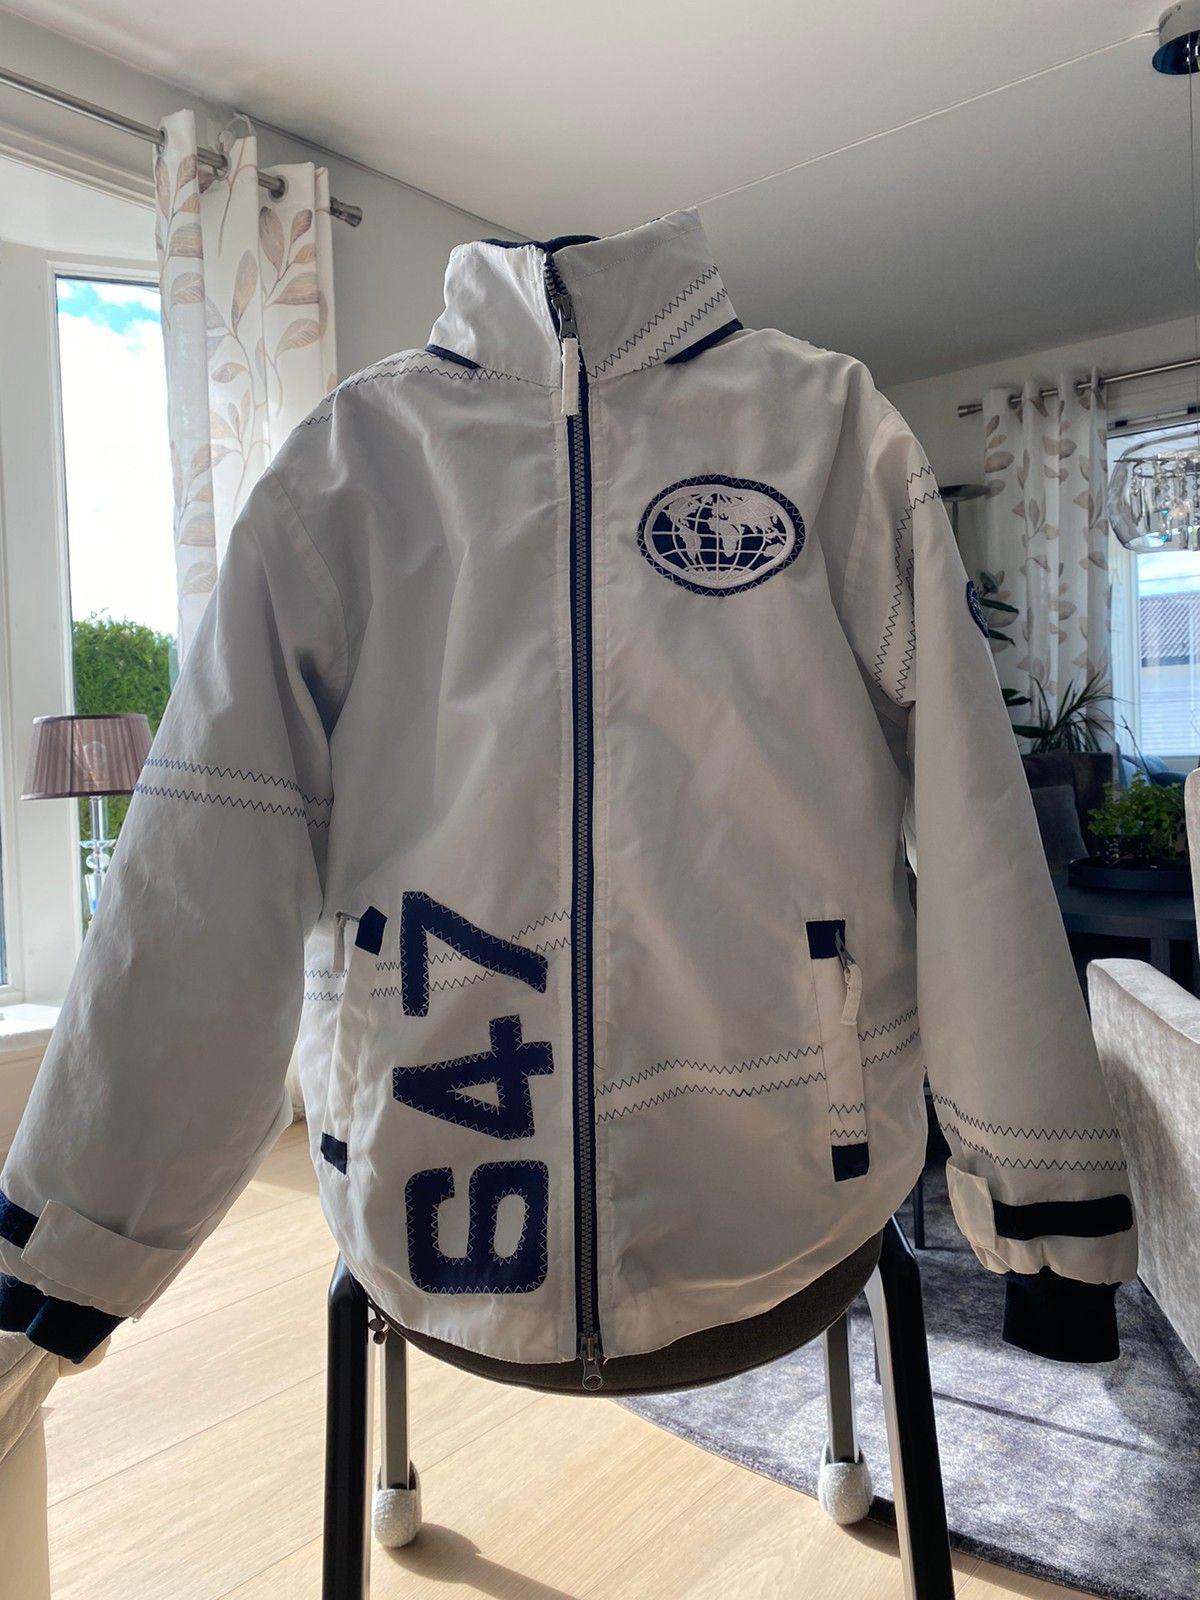 QUBA Sails jakke til ungdom mellom 150 cm | FINN.no